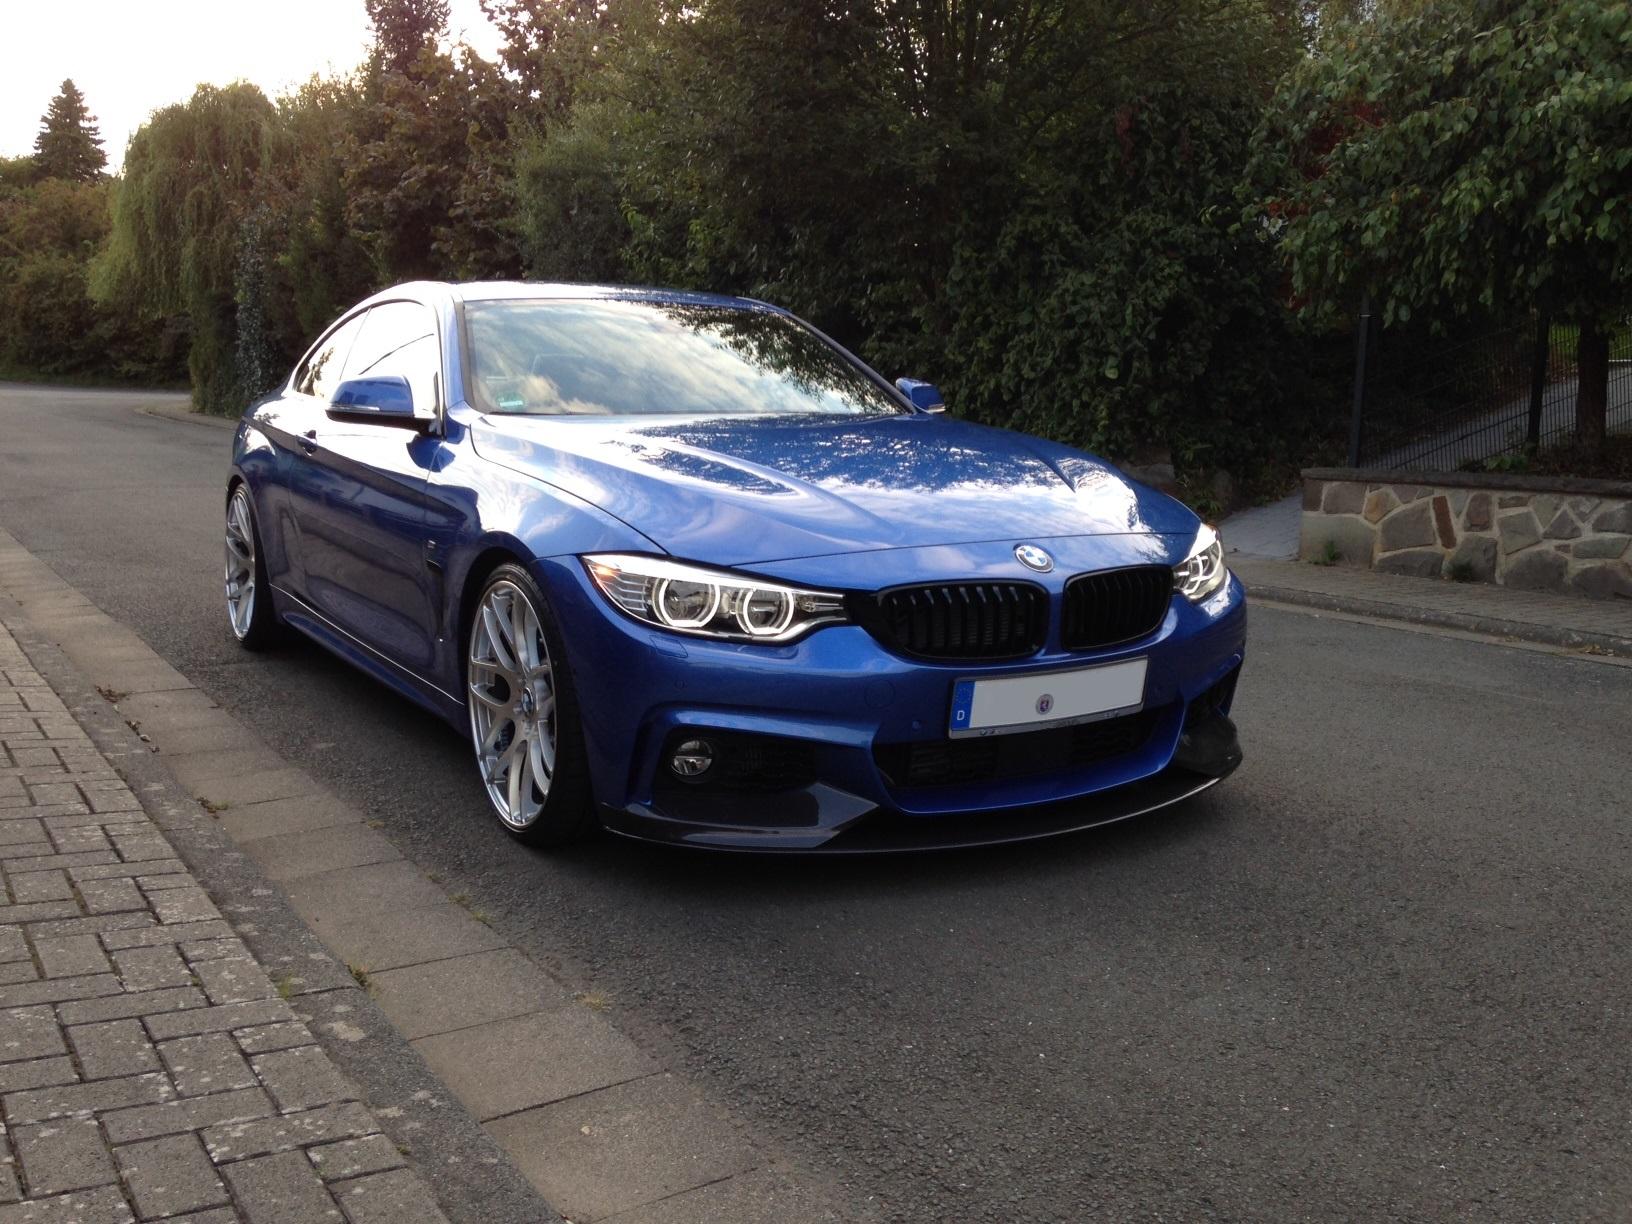 BMW 435i - Gambit, 1-tlg, 20 Zoll - BMW - Bildergalerie ... X 23 Gambit